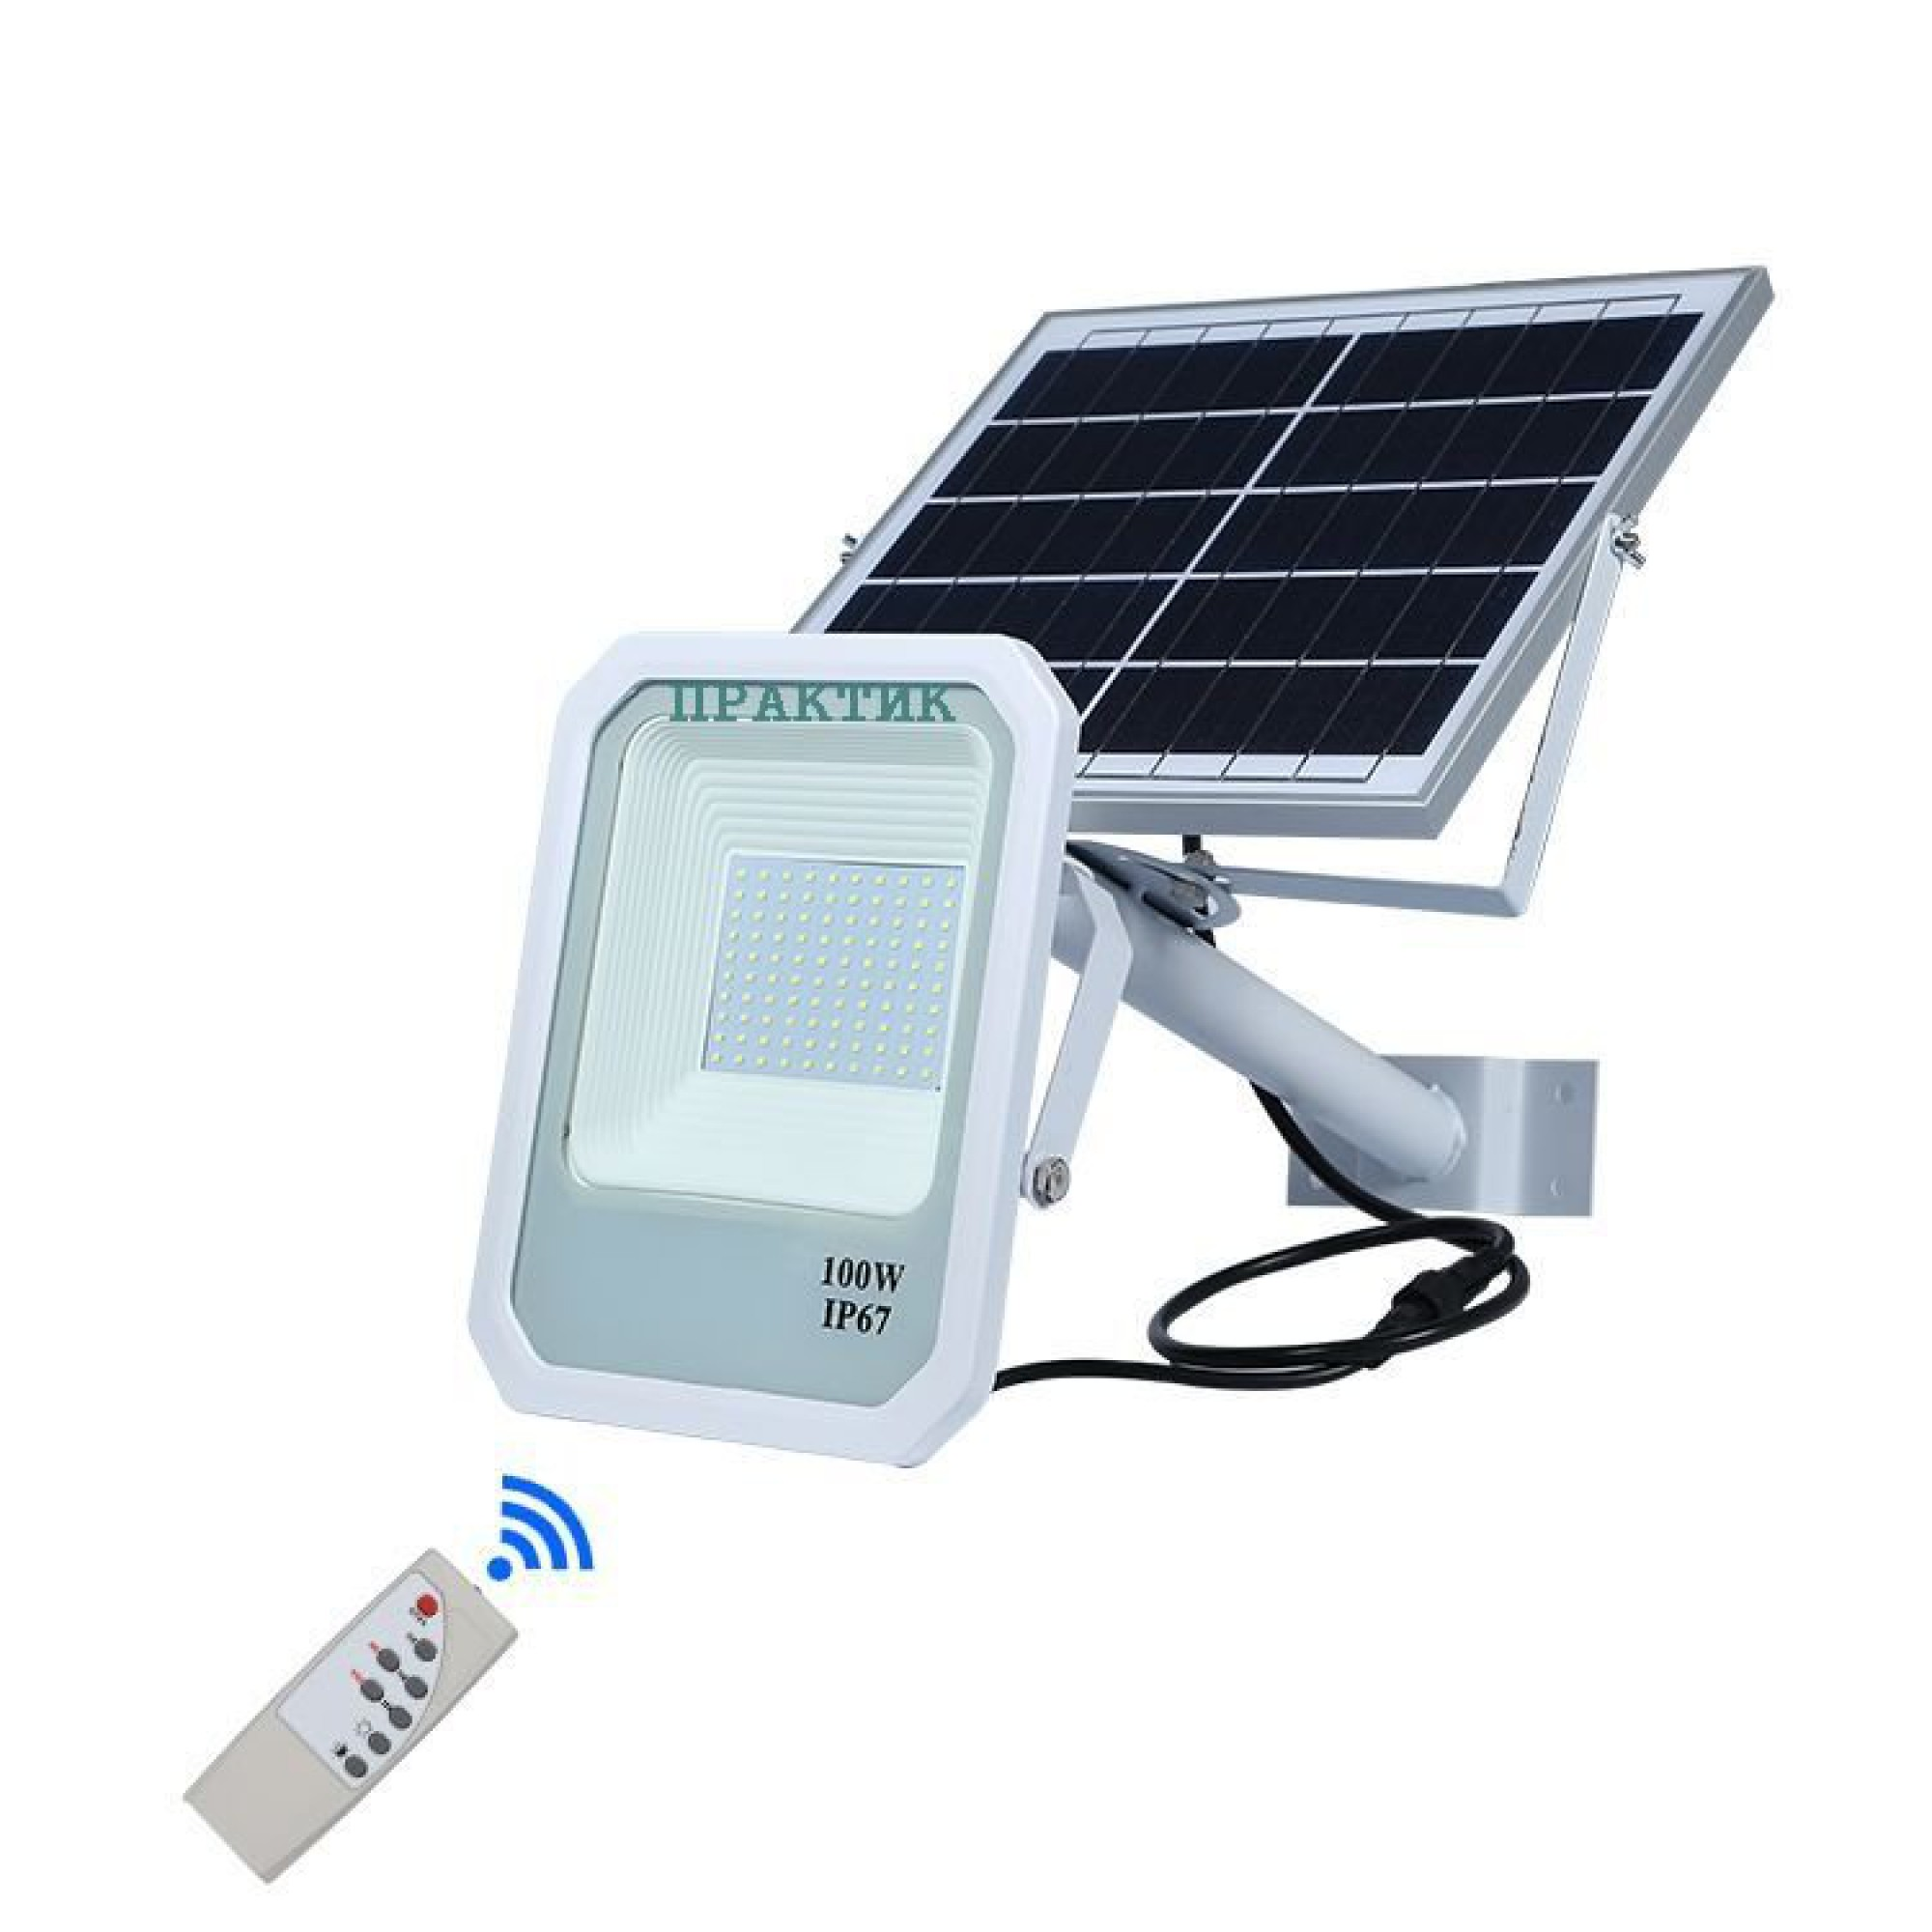 Прожектор на солнечной батареи.